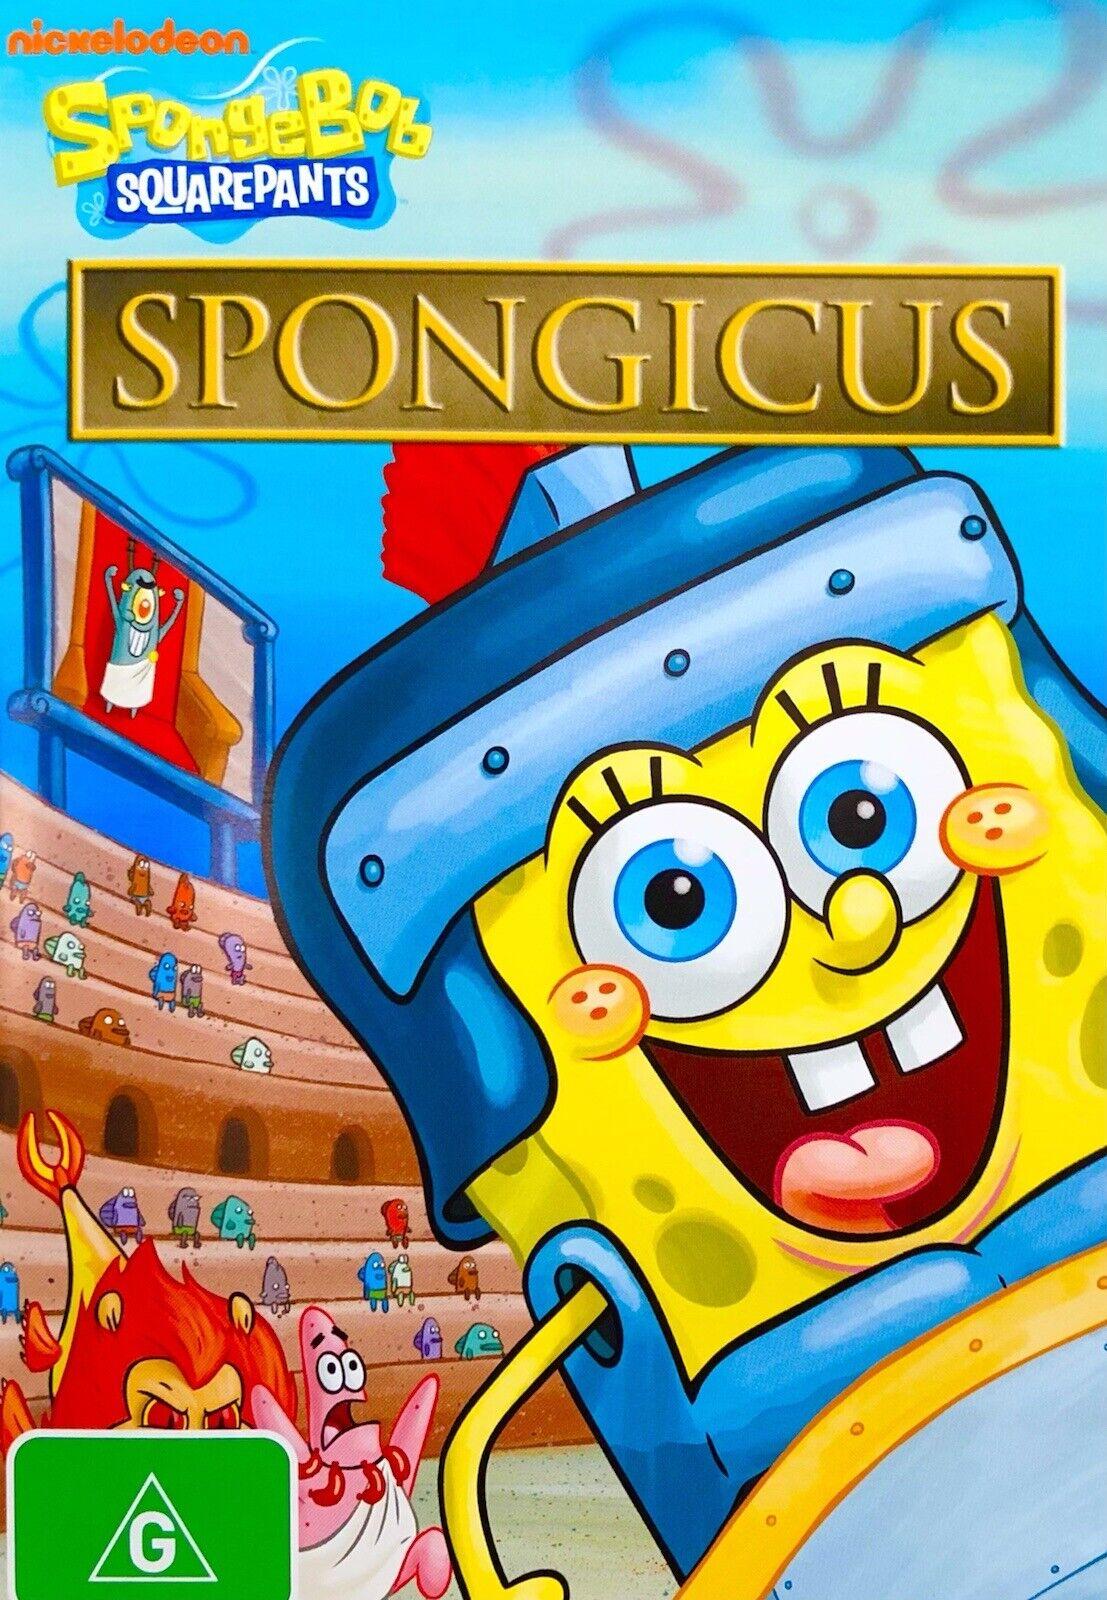 File:SpongeBob original Spongicus Australian DVD.jpg